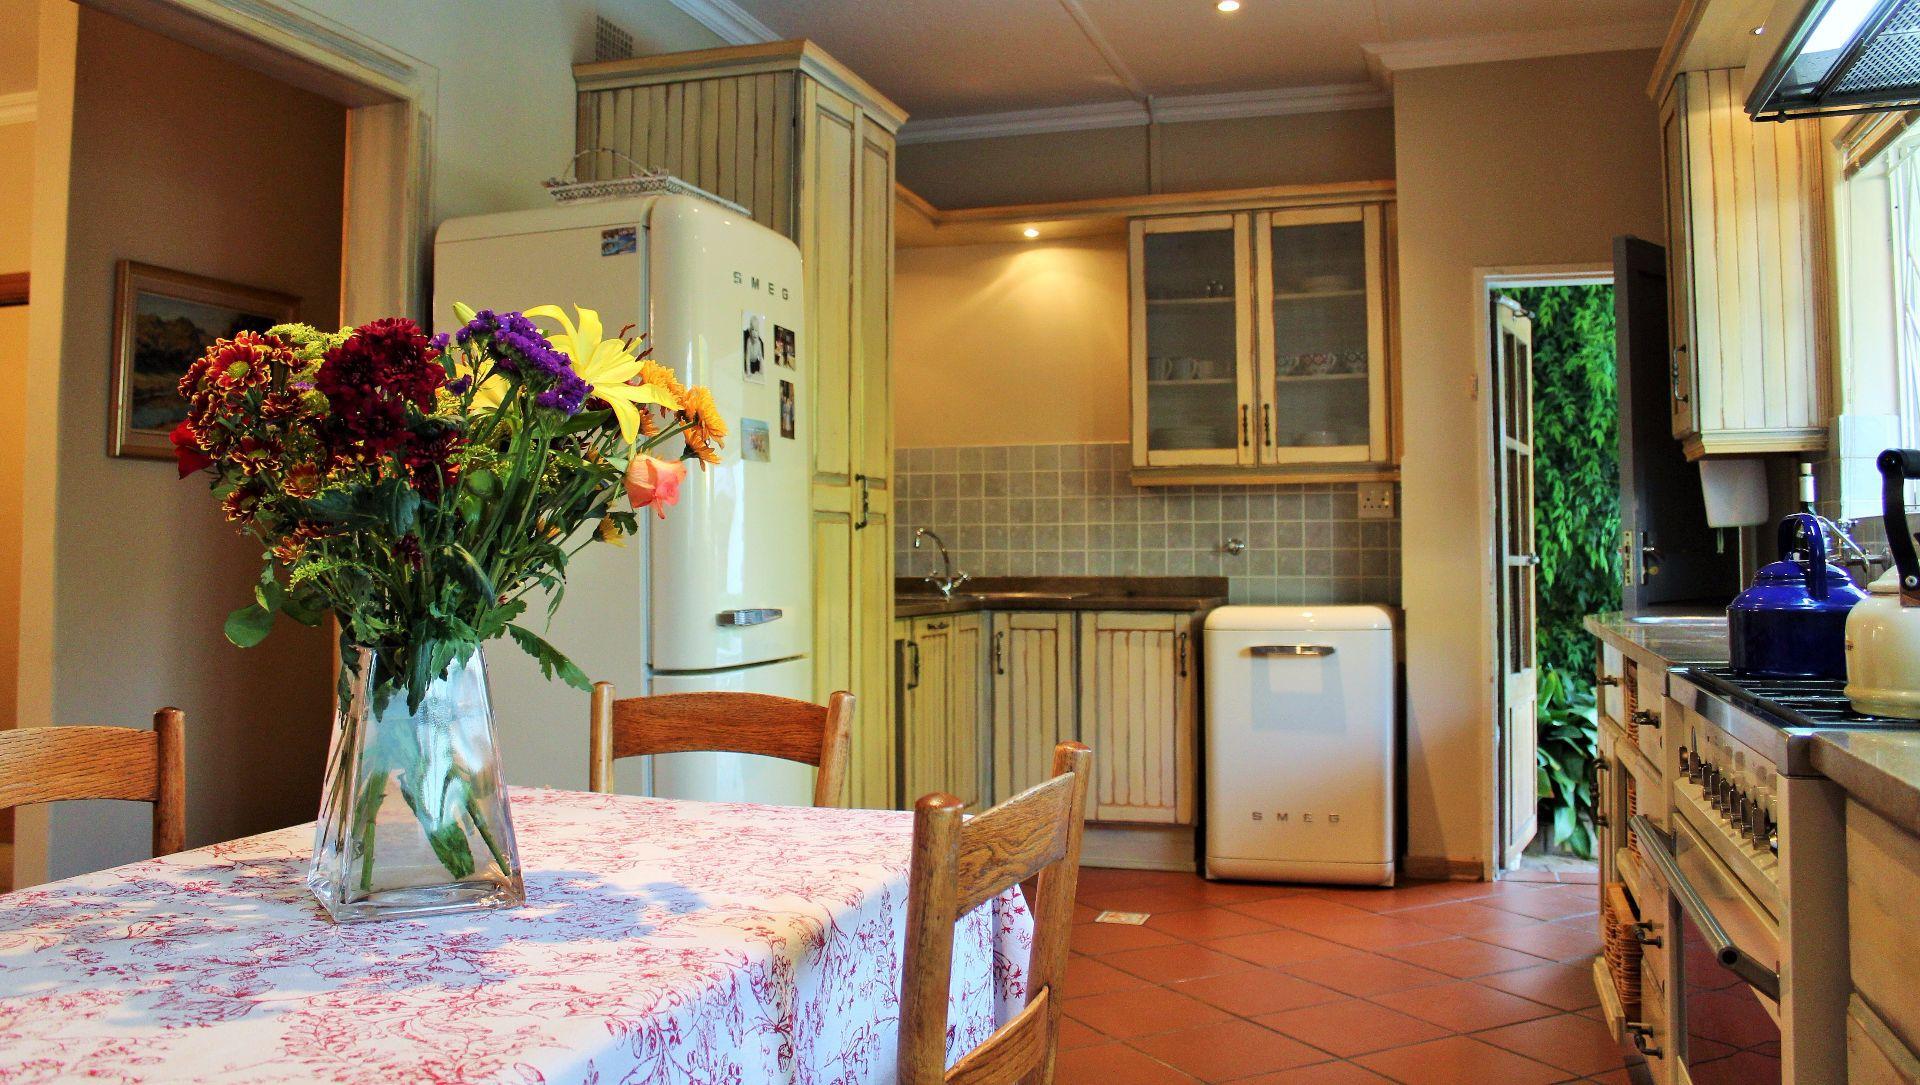 Heilige Akker property for sale. Ref No: 13540532. Picture no 6